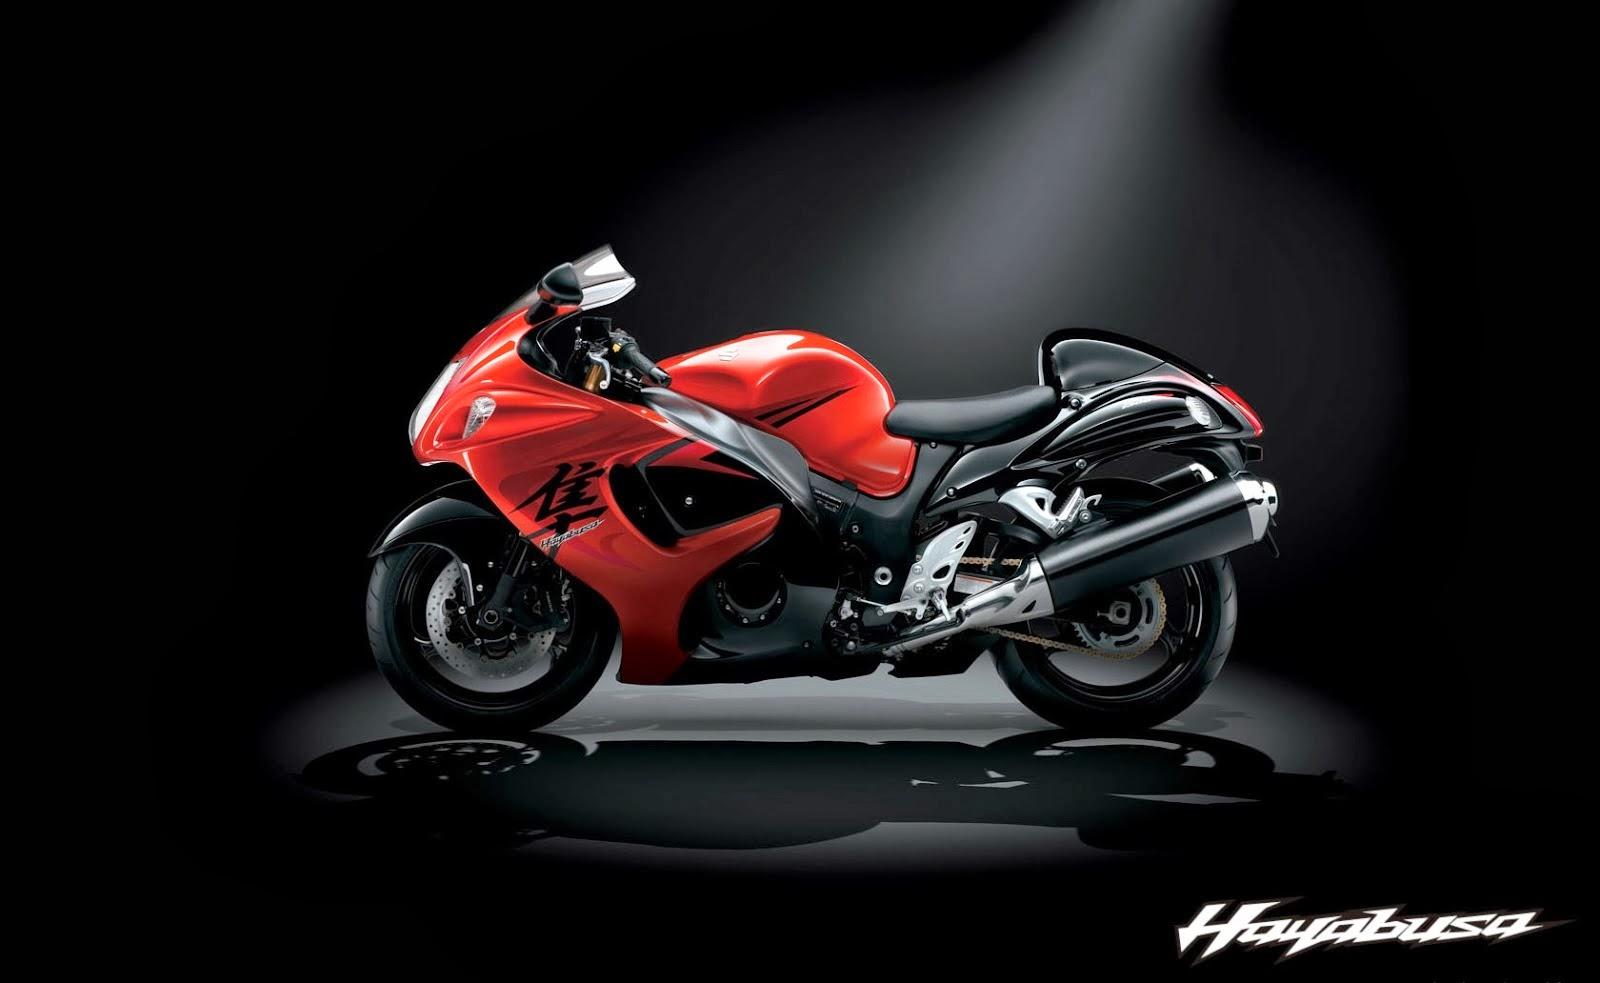 hd wallpapers download suzuki hayabusa sports bikes hd